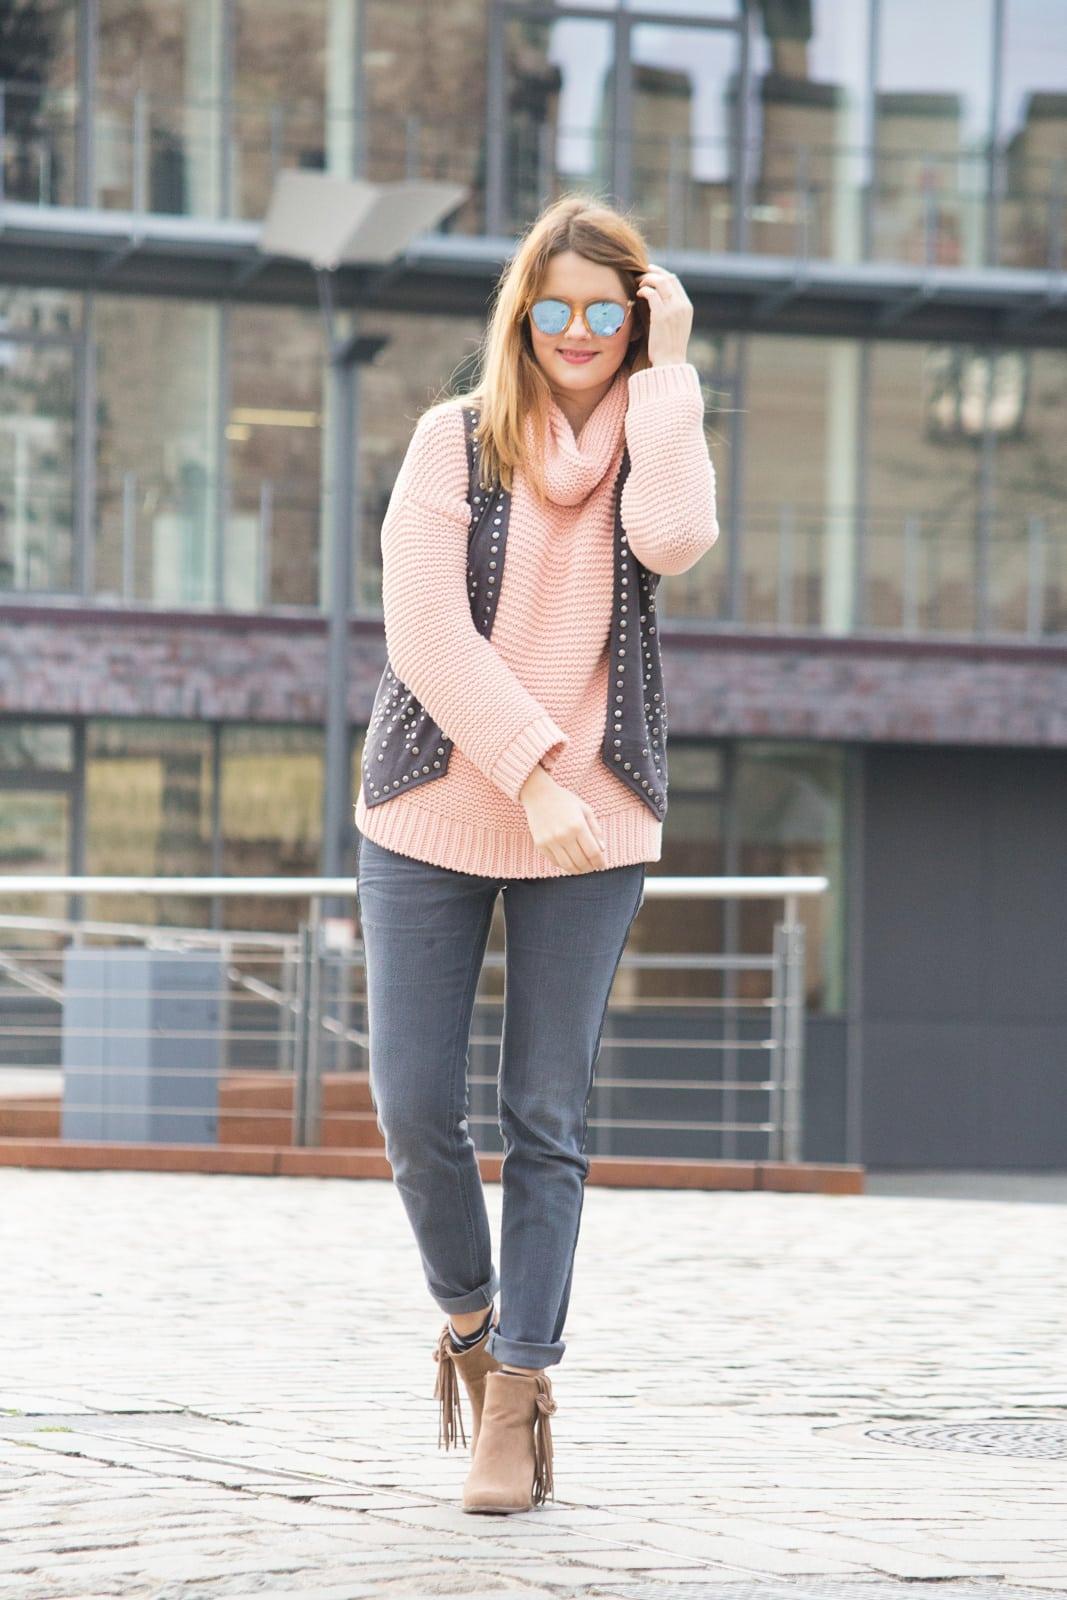 70ies Trends im Winter: Outfit mit Rollkragenpullover & Nietenweste